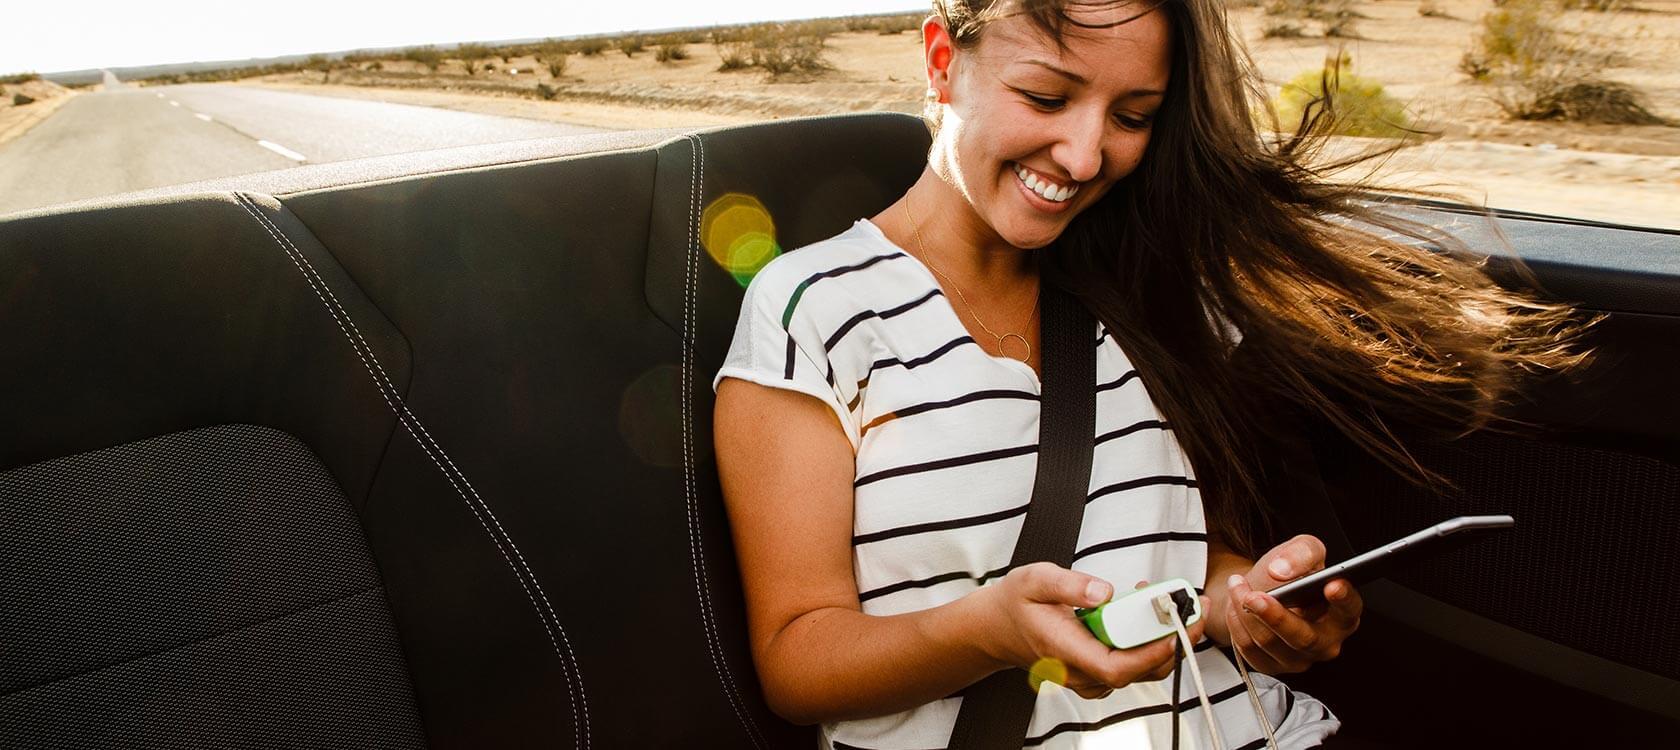 belkin-portable-charging-photo-lifestyle-roadtrip-convertible